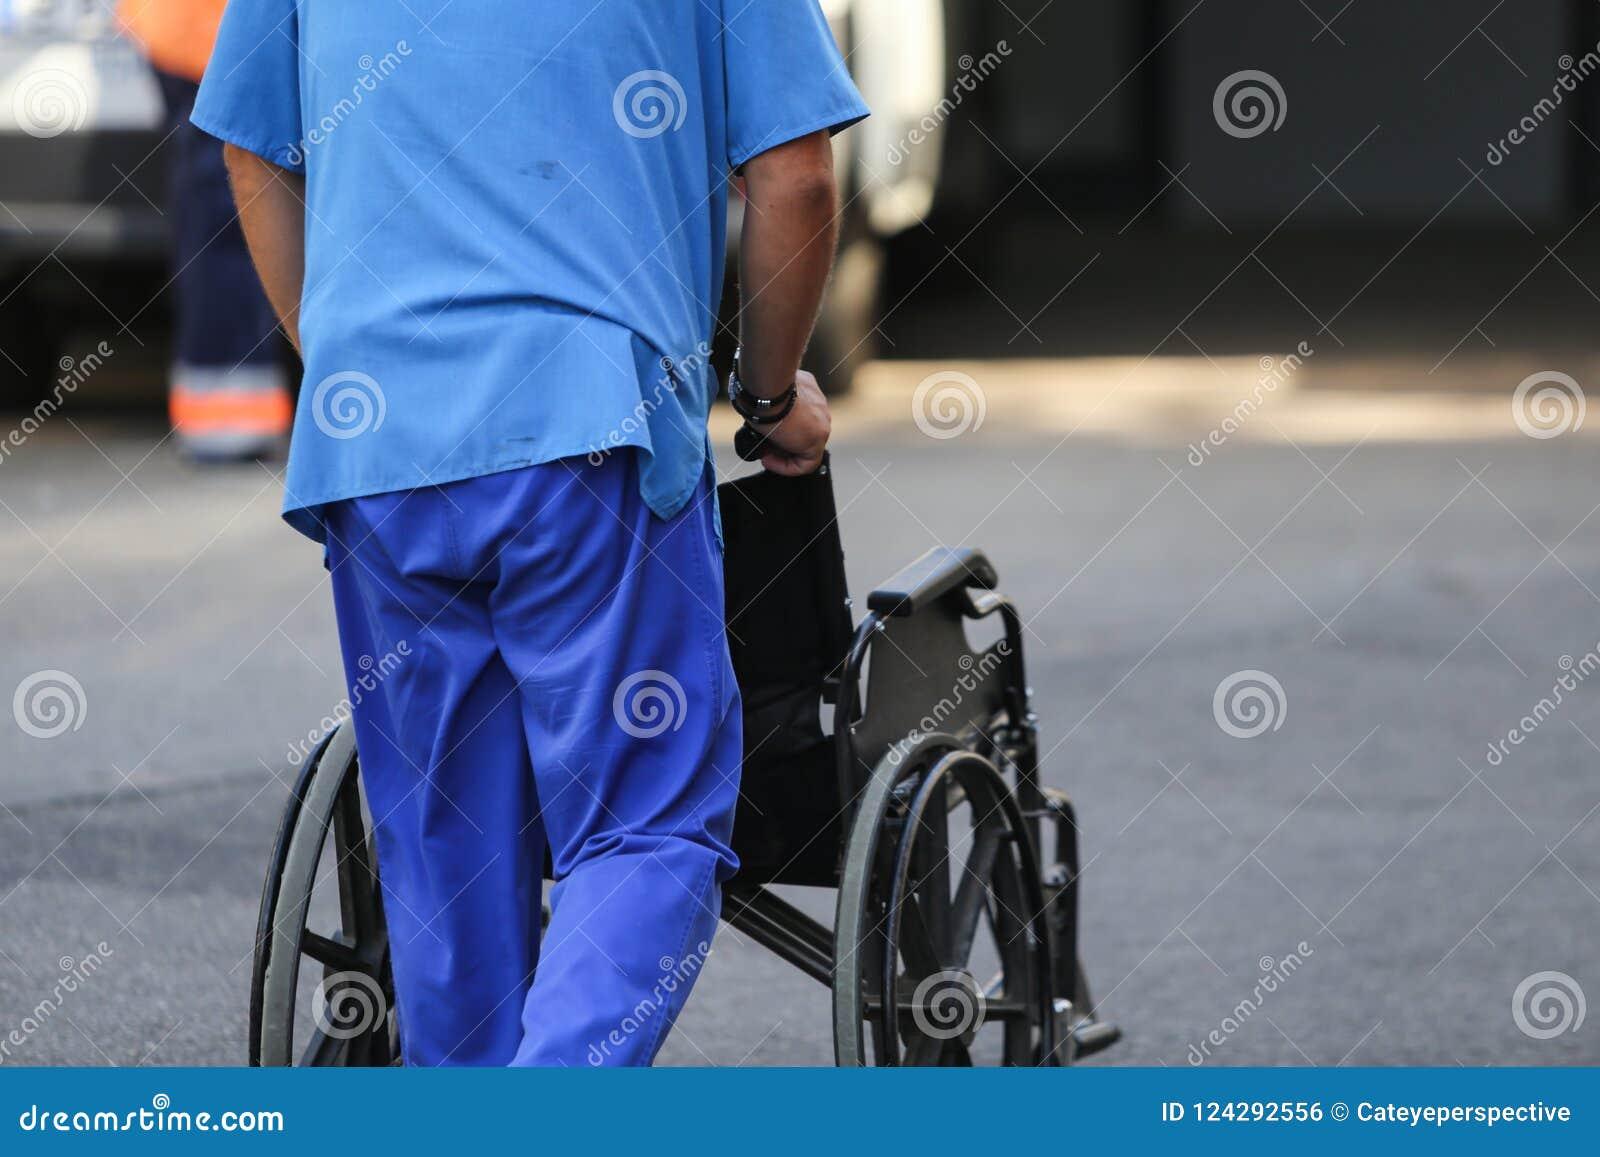 Una Vacía Enfermera Sexo Que Ruedas Empuja Silla De Masculino Yy6fgvb7 BQdxeWrCoE